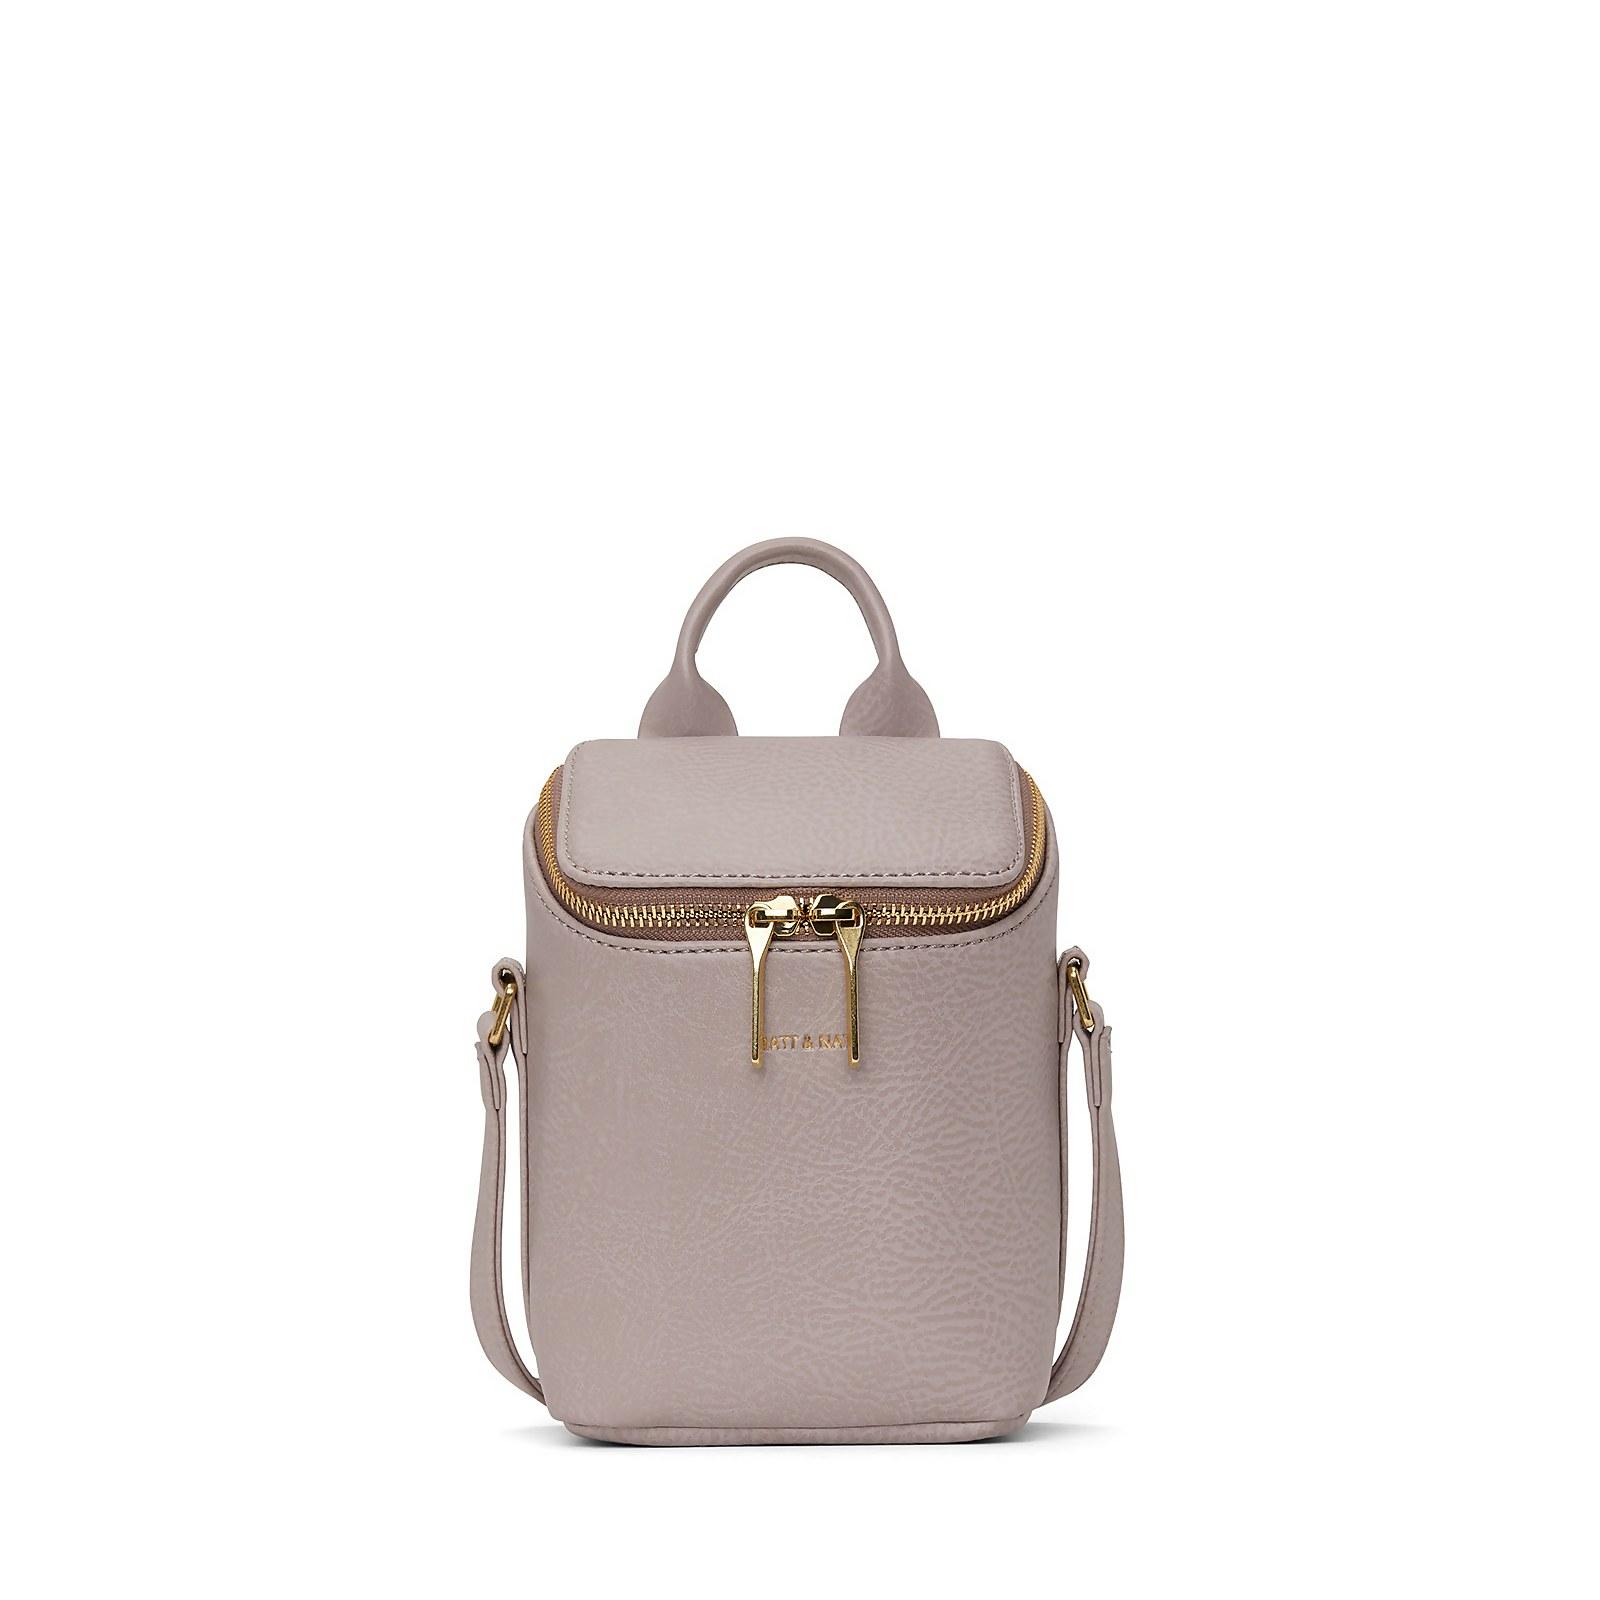 Matt & Nat Women's Brave Micro Dwell Cross Body Bag - Serene